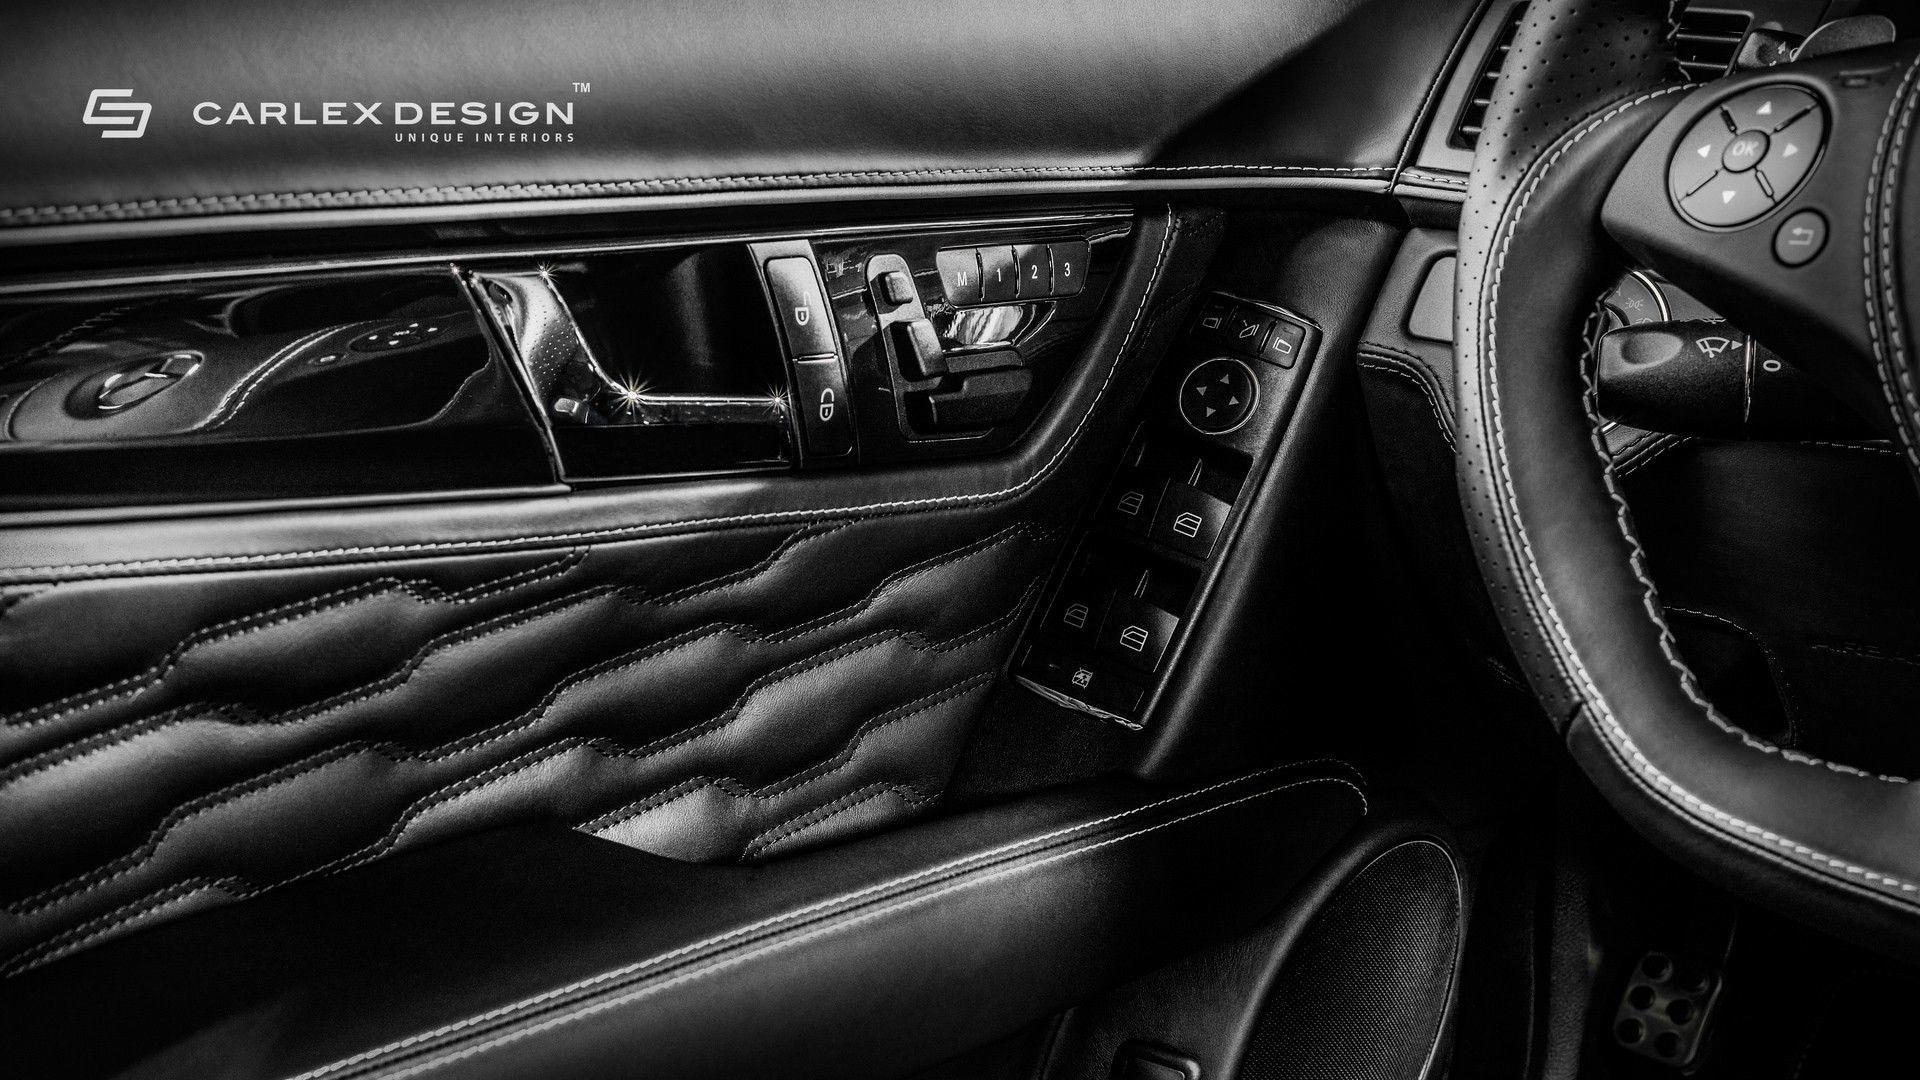 Mercedes C63 AMG Interior Was Not Good Enough For Carlex Design